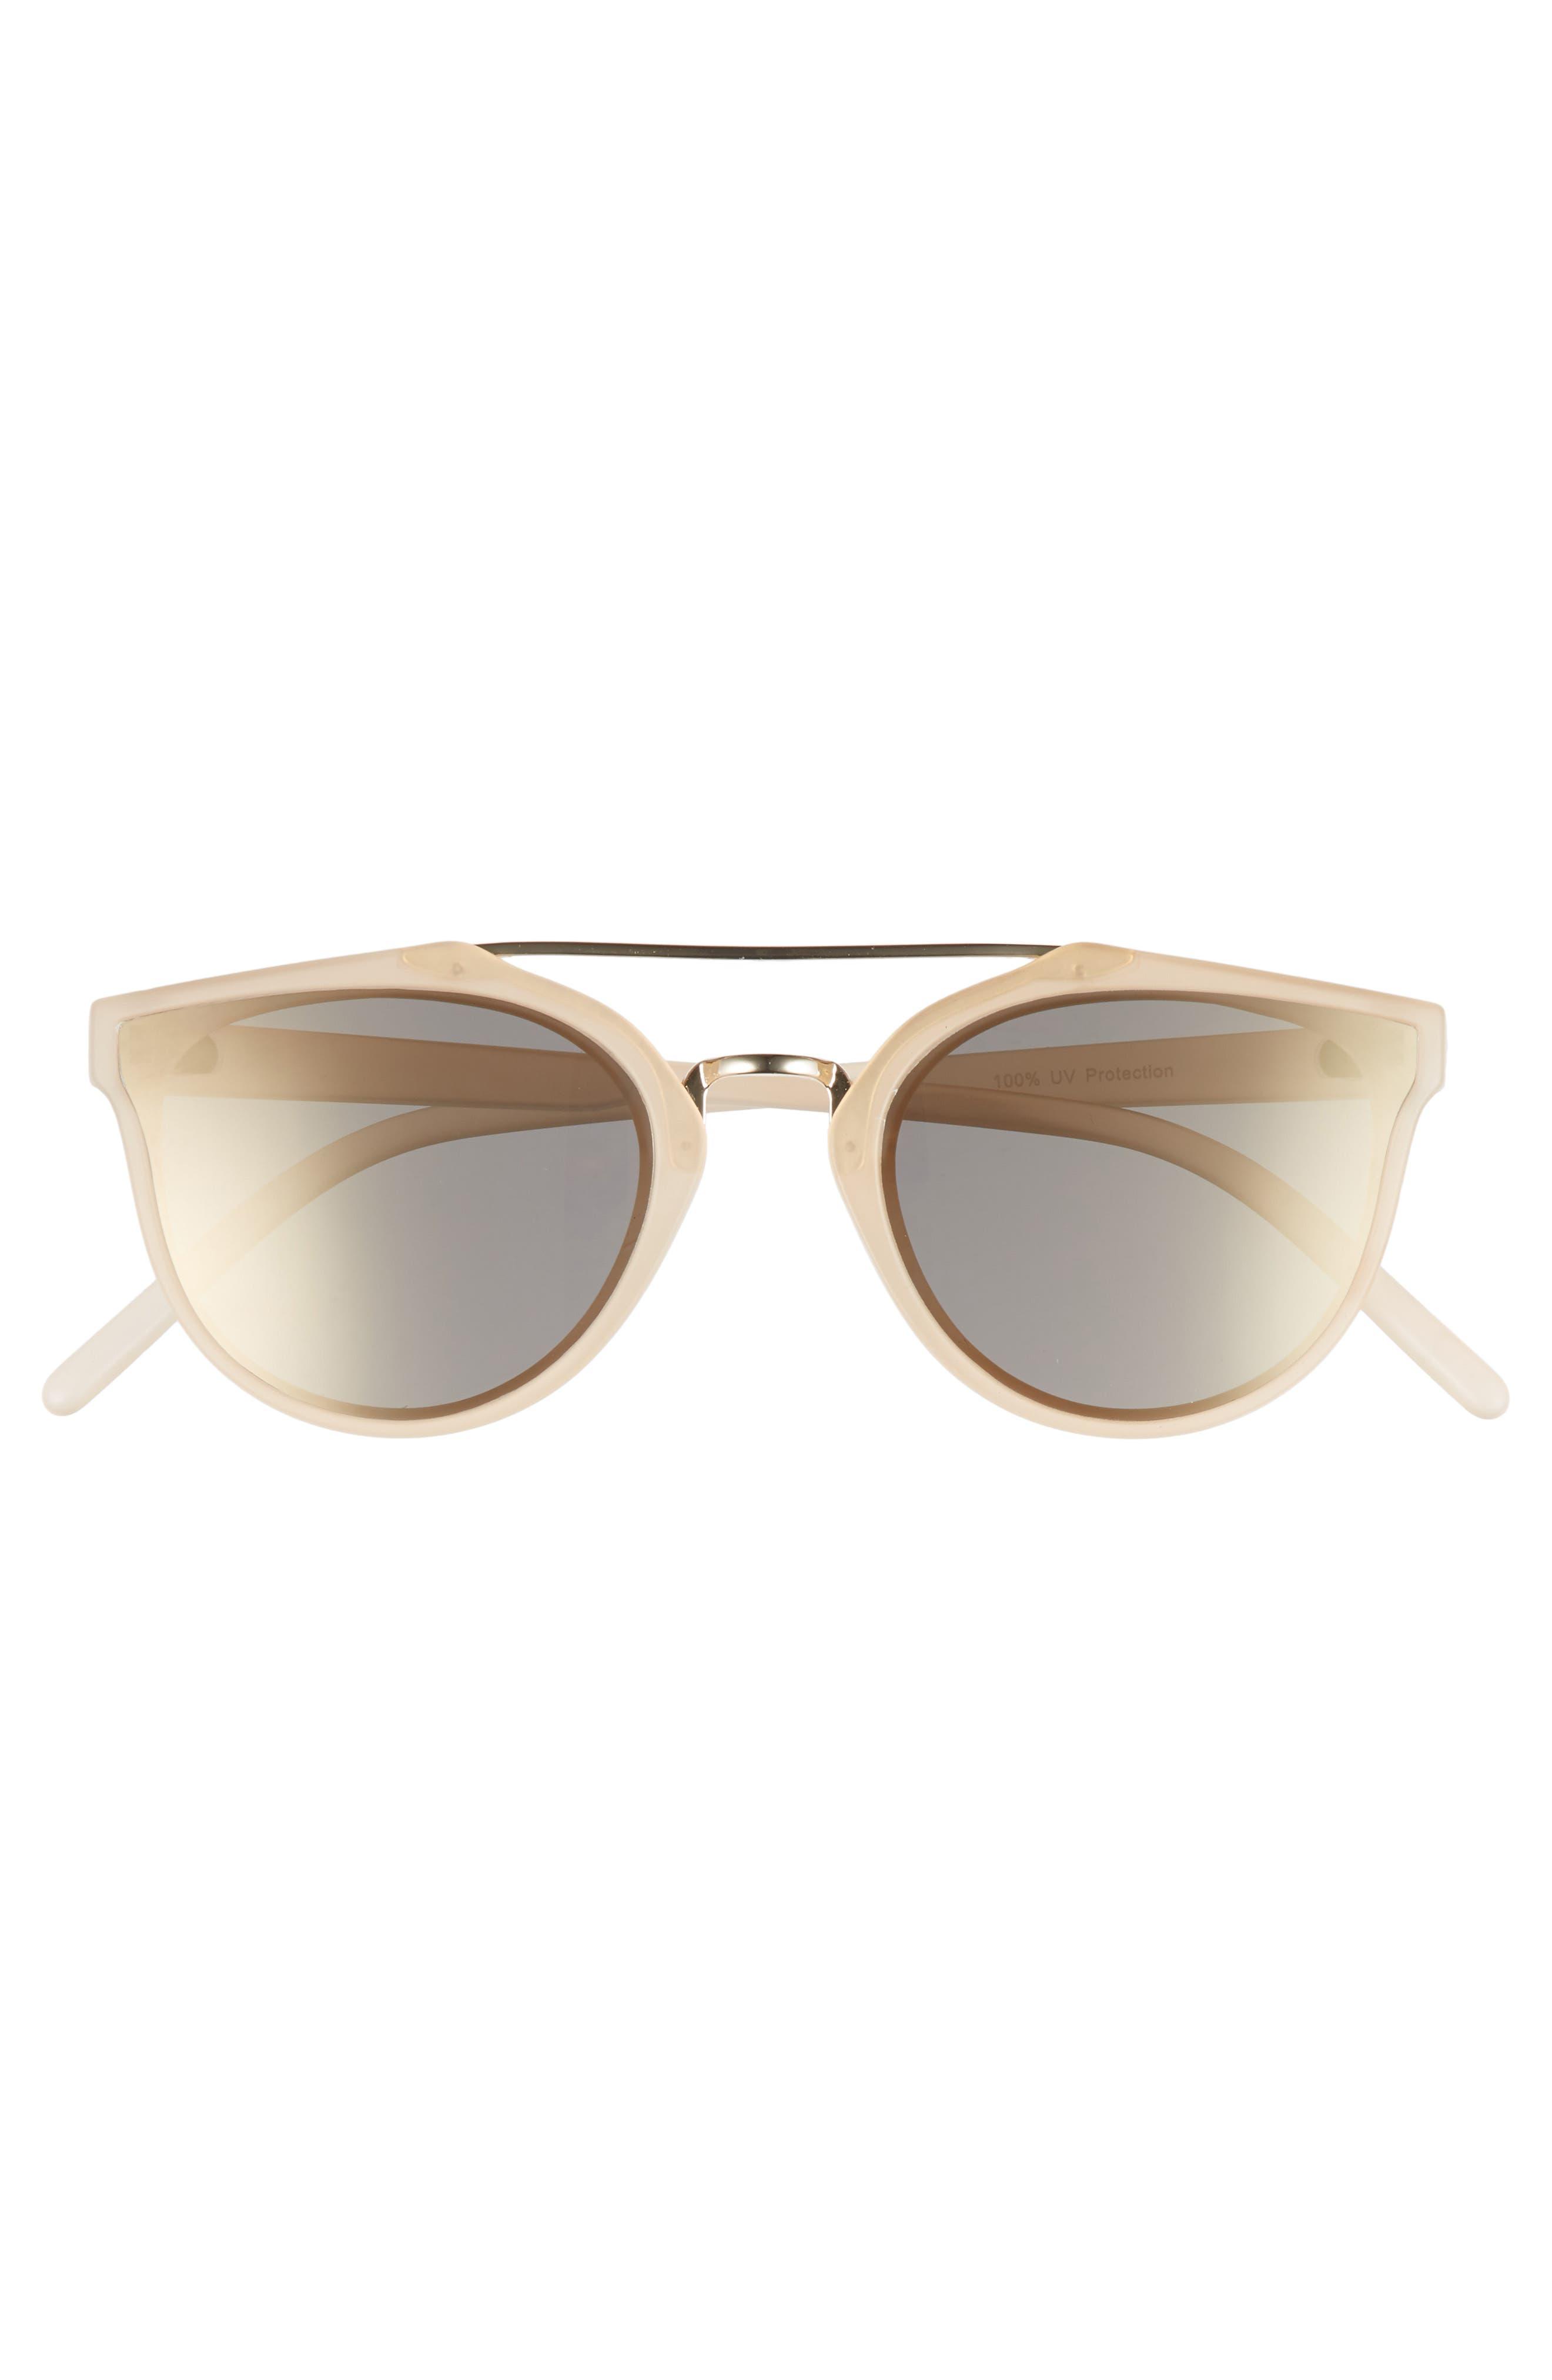 Aviator Sunglasses,                             Alternate thumbnail 3, color,                             Milky Peach/ Gold